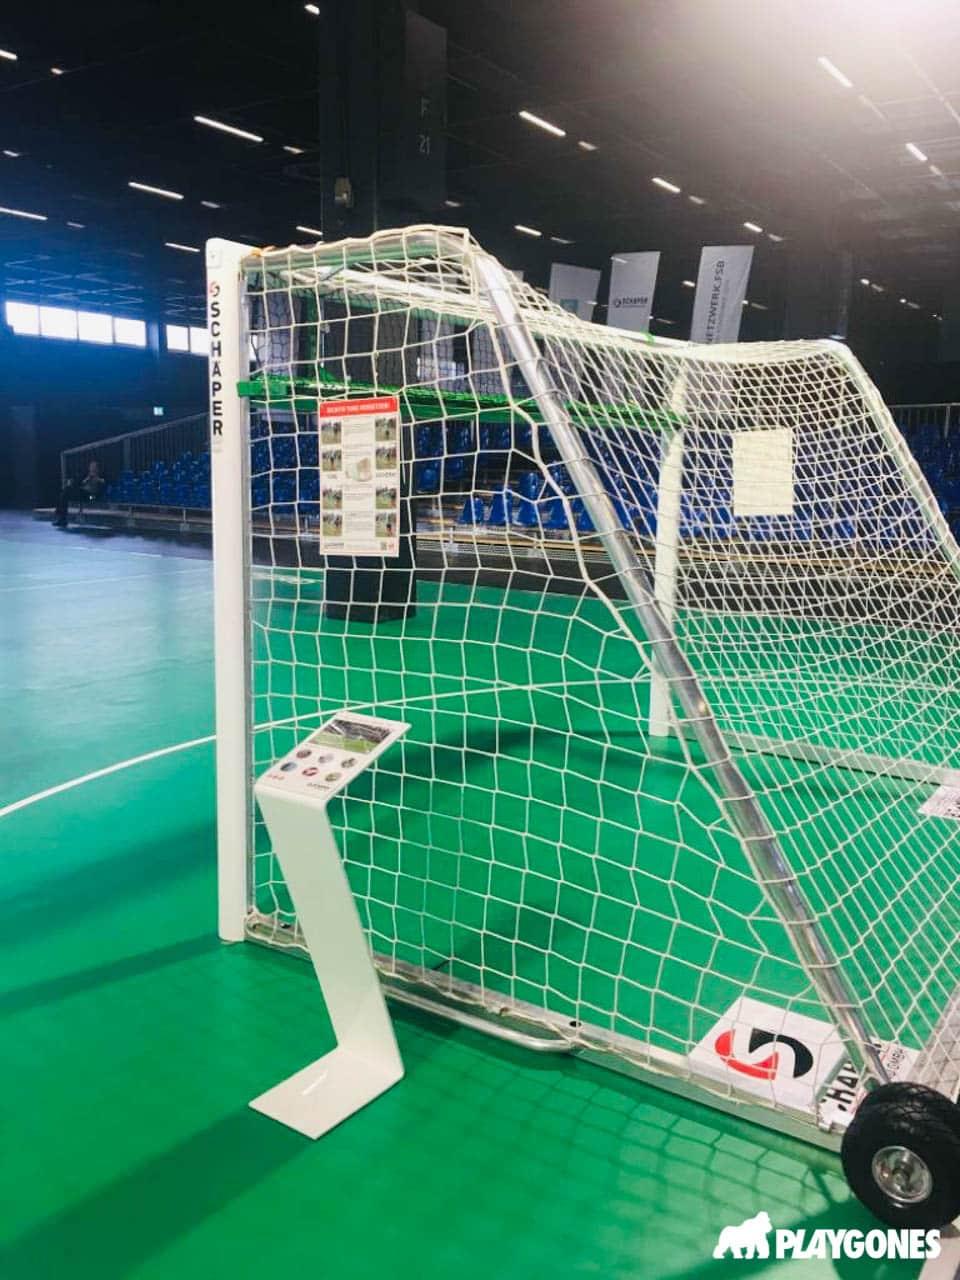 Shaëper - les équipements sportifs haut de gamme